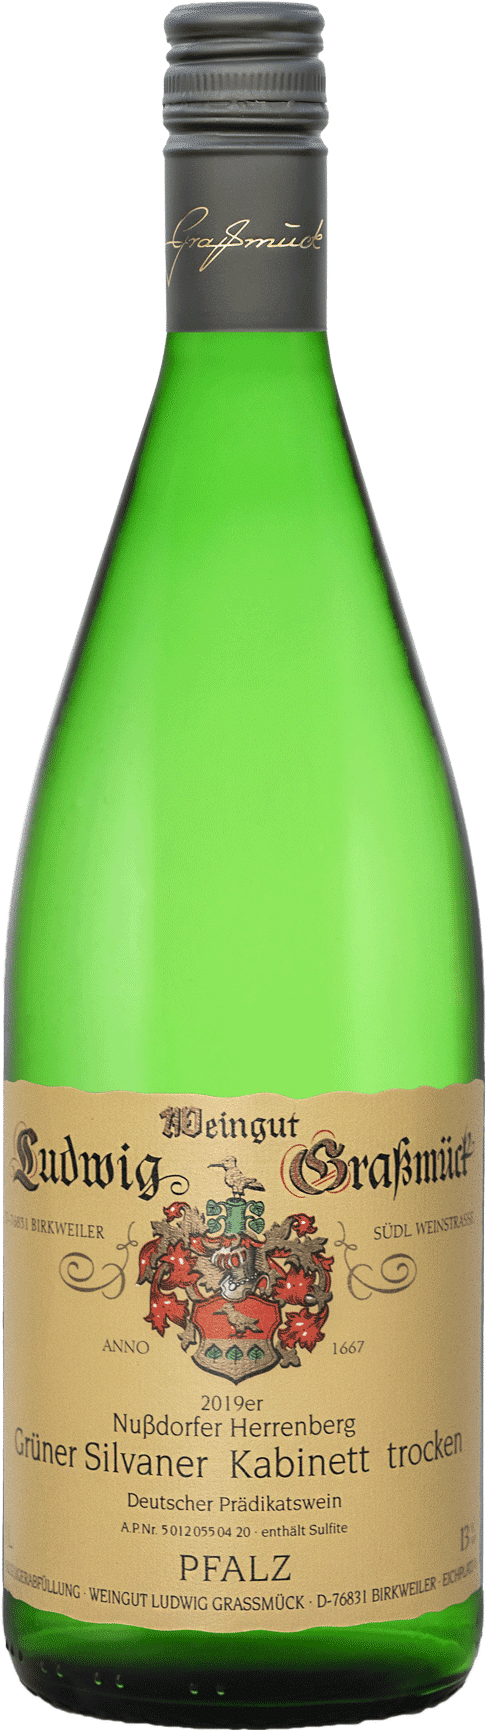 Weingut Ludwig Graßmück, Simon Graßmück, Birkweiler Kastanienbusch Riesling Kabinett Grüner Silvaner Kabinett trocken 2019